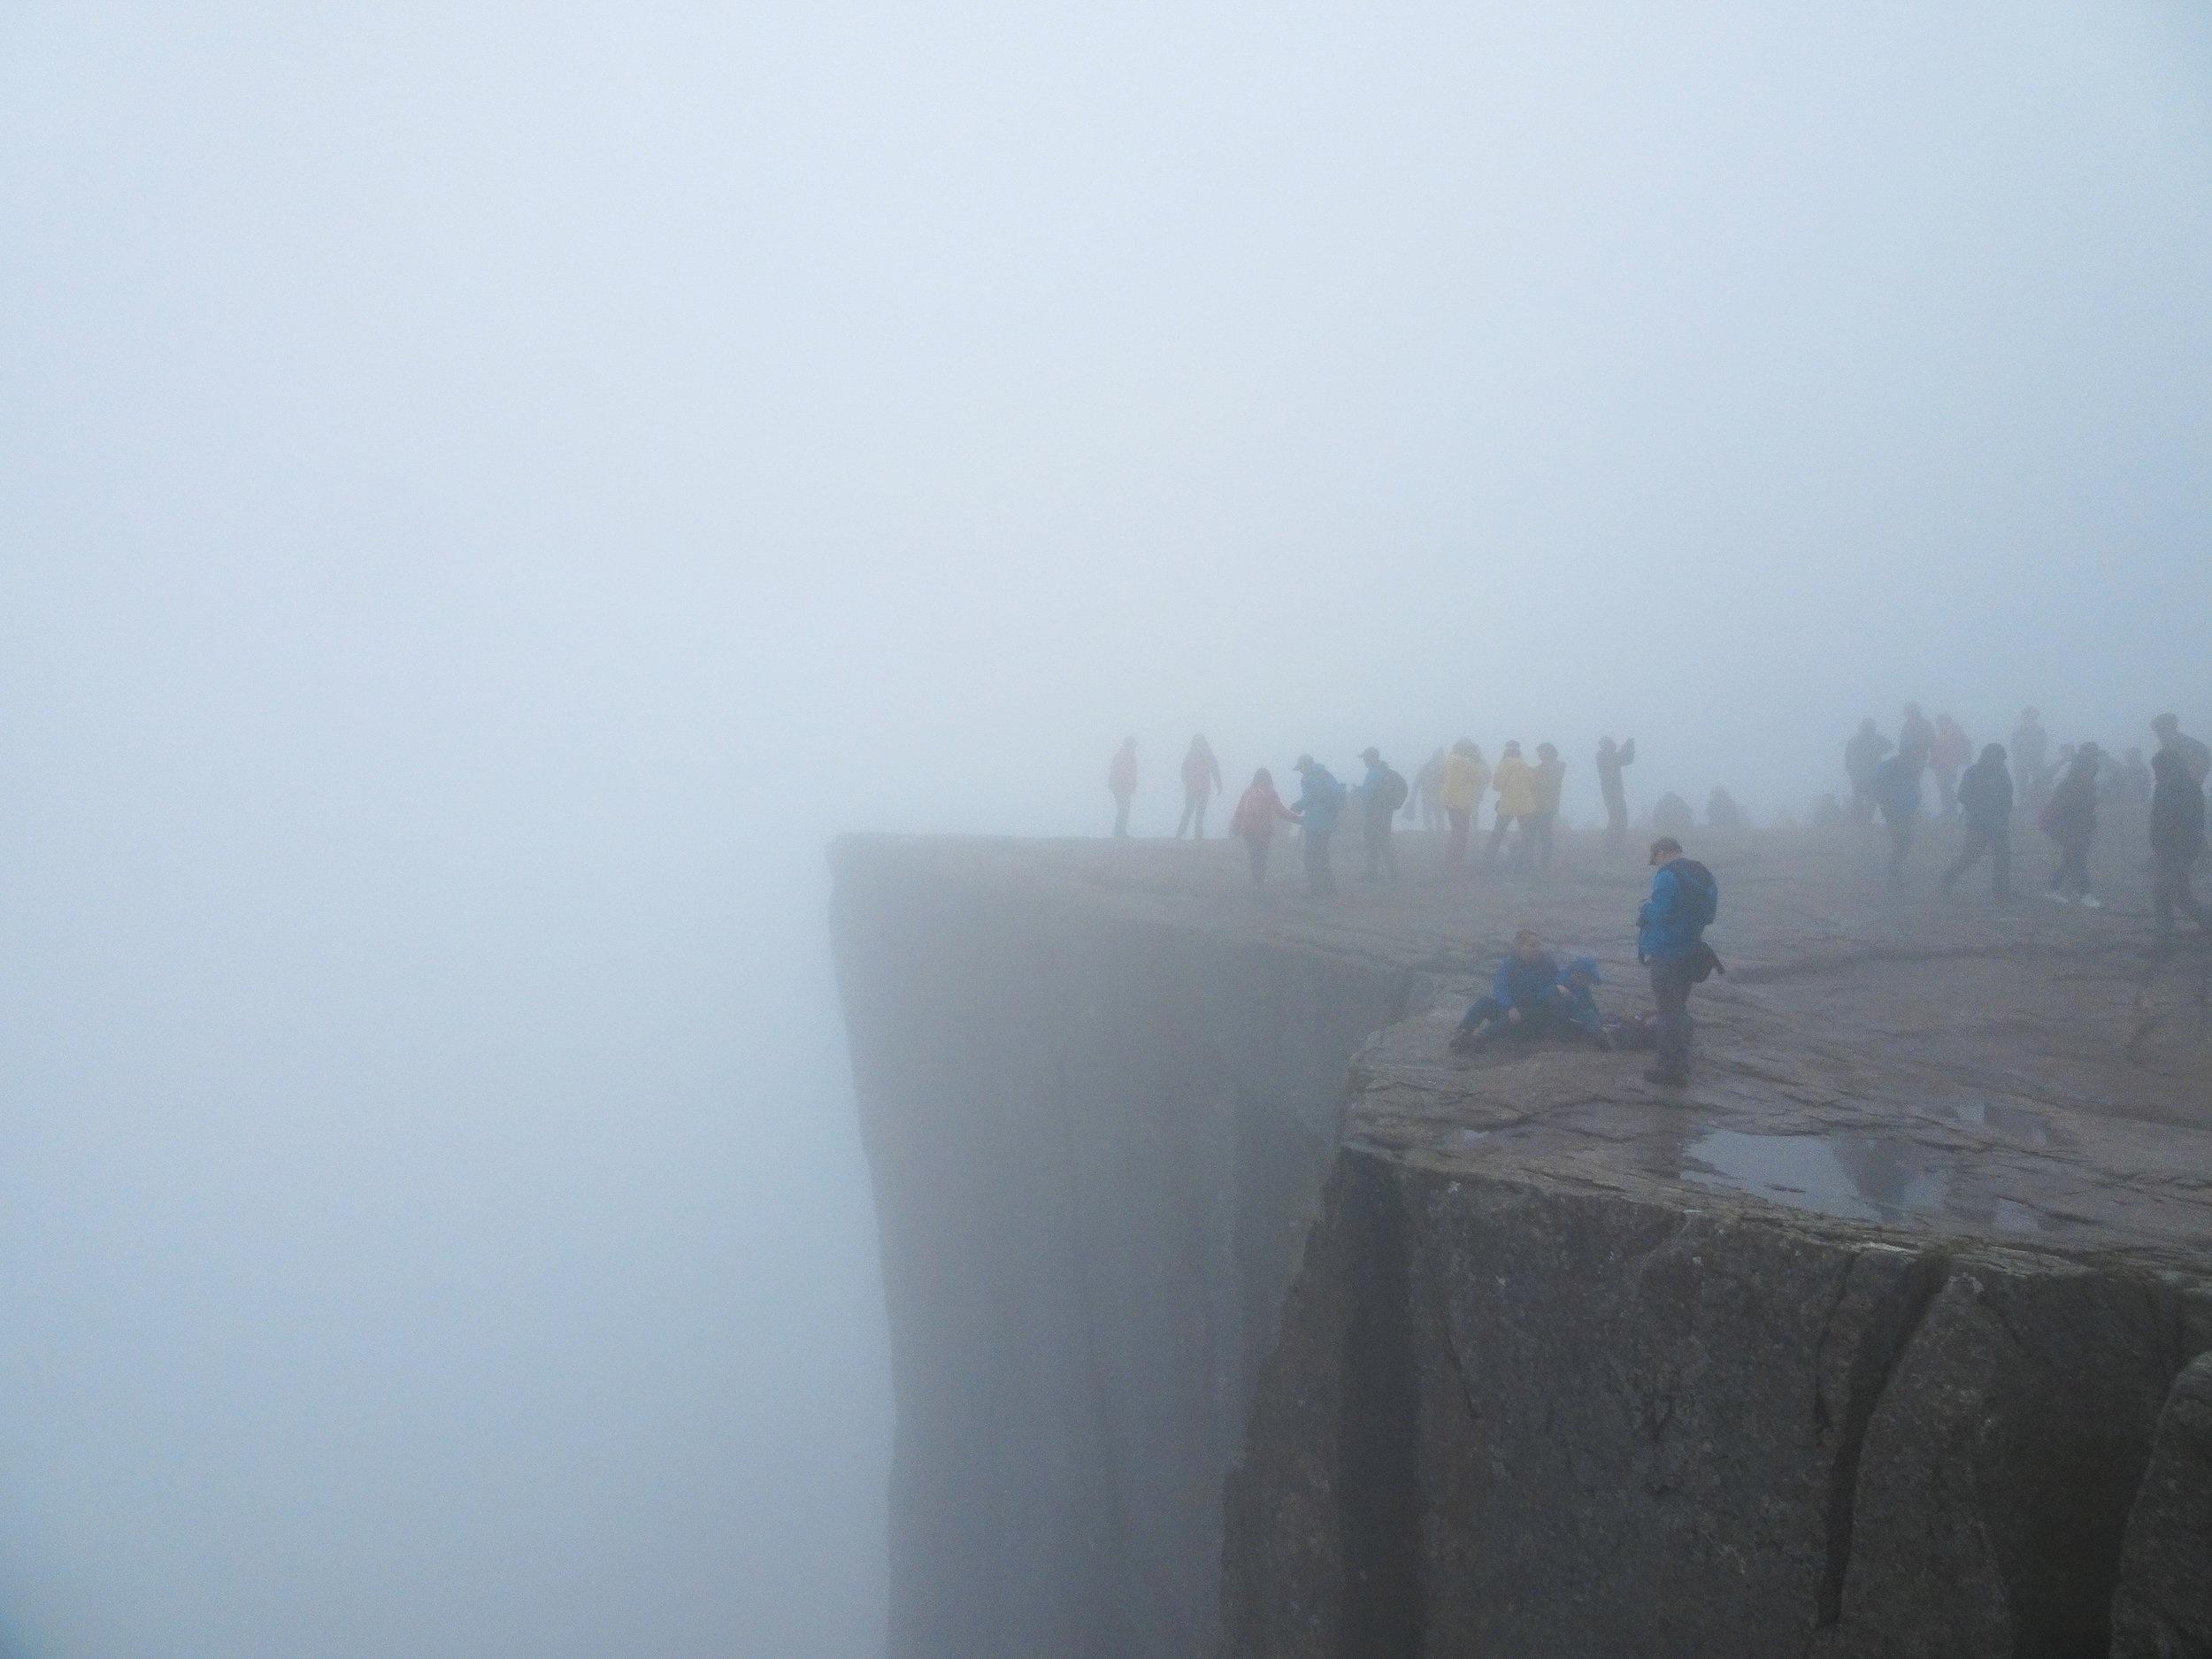 preikestolen on a foggy day